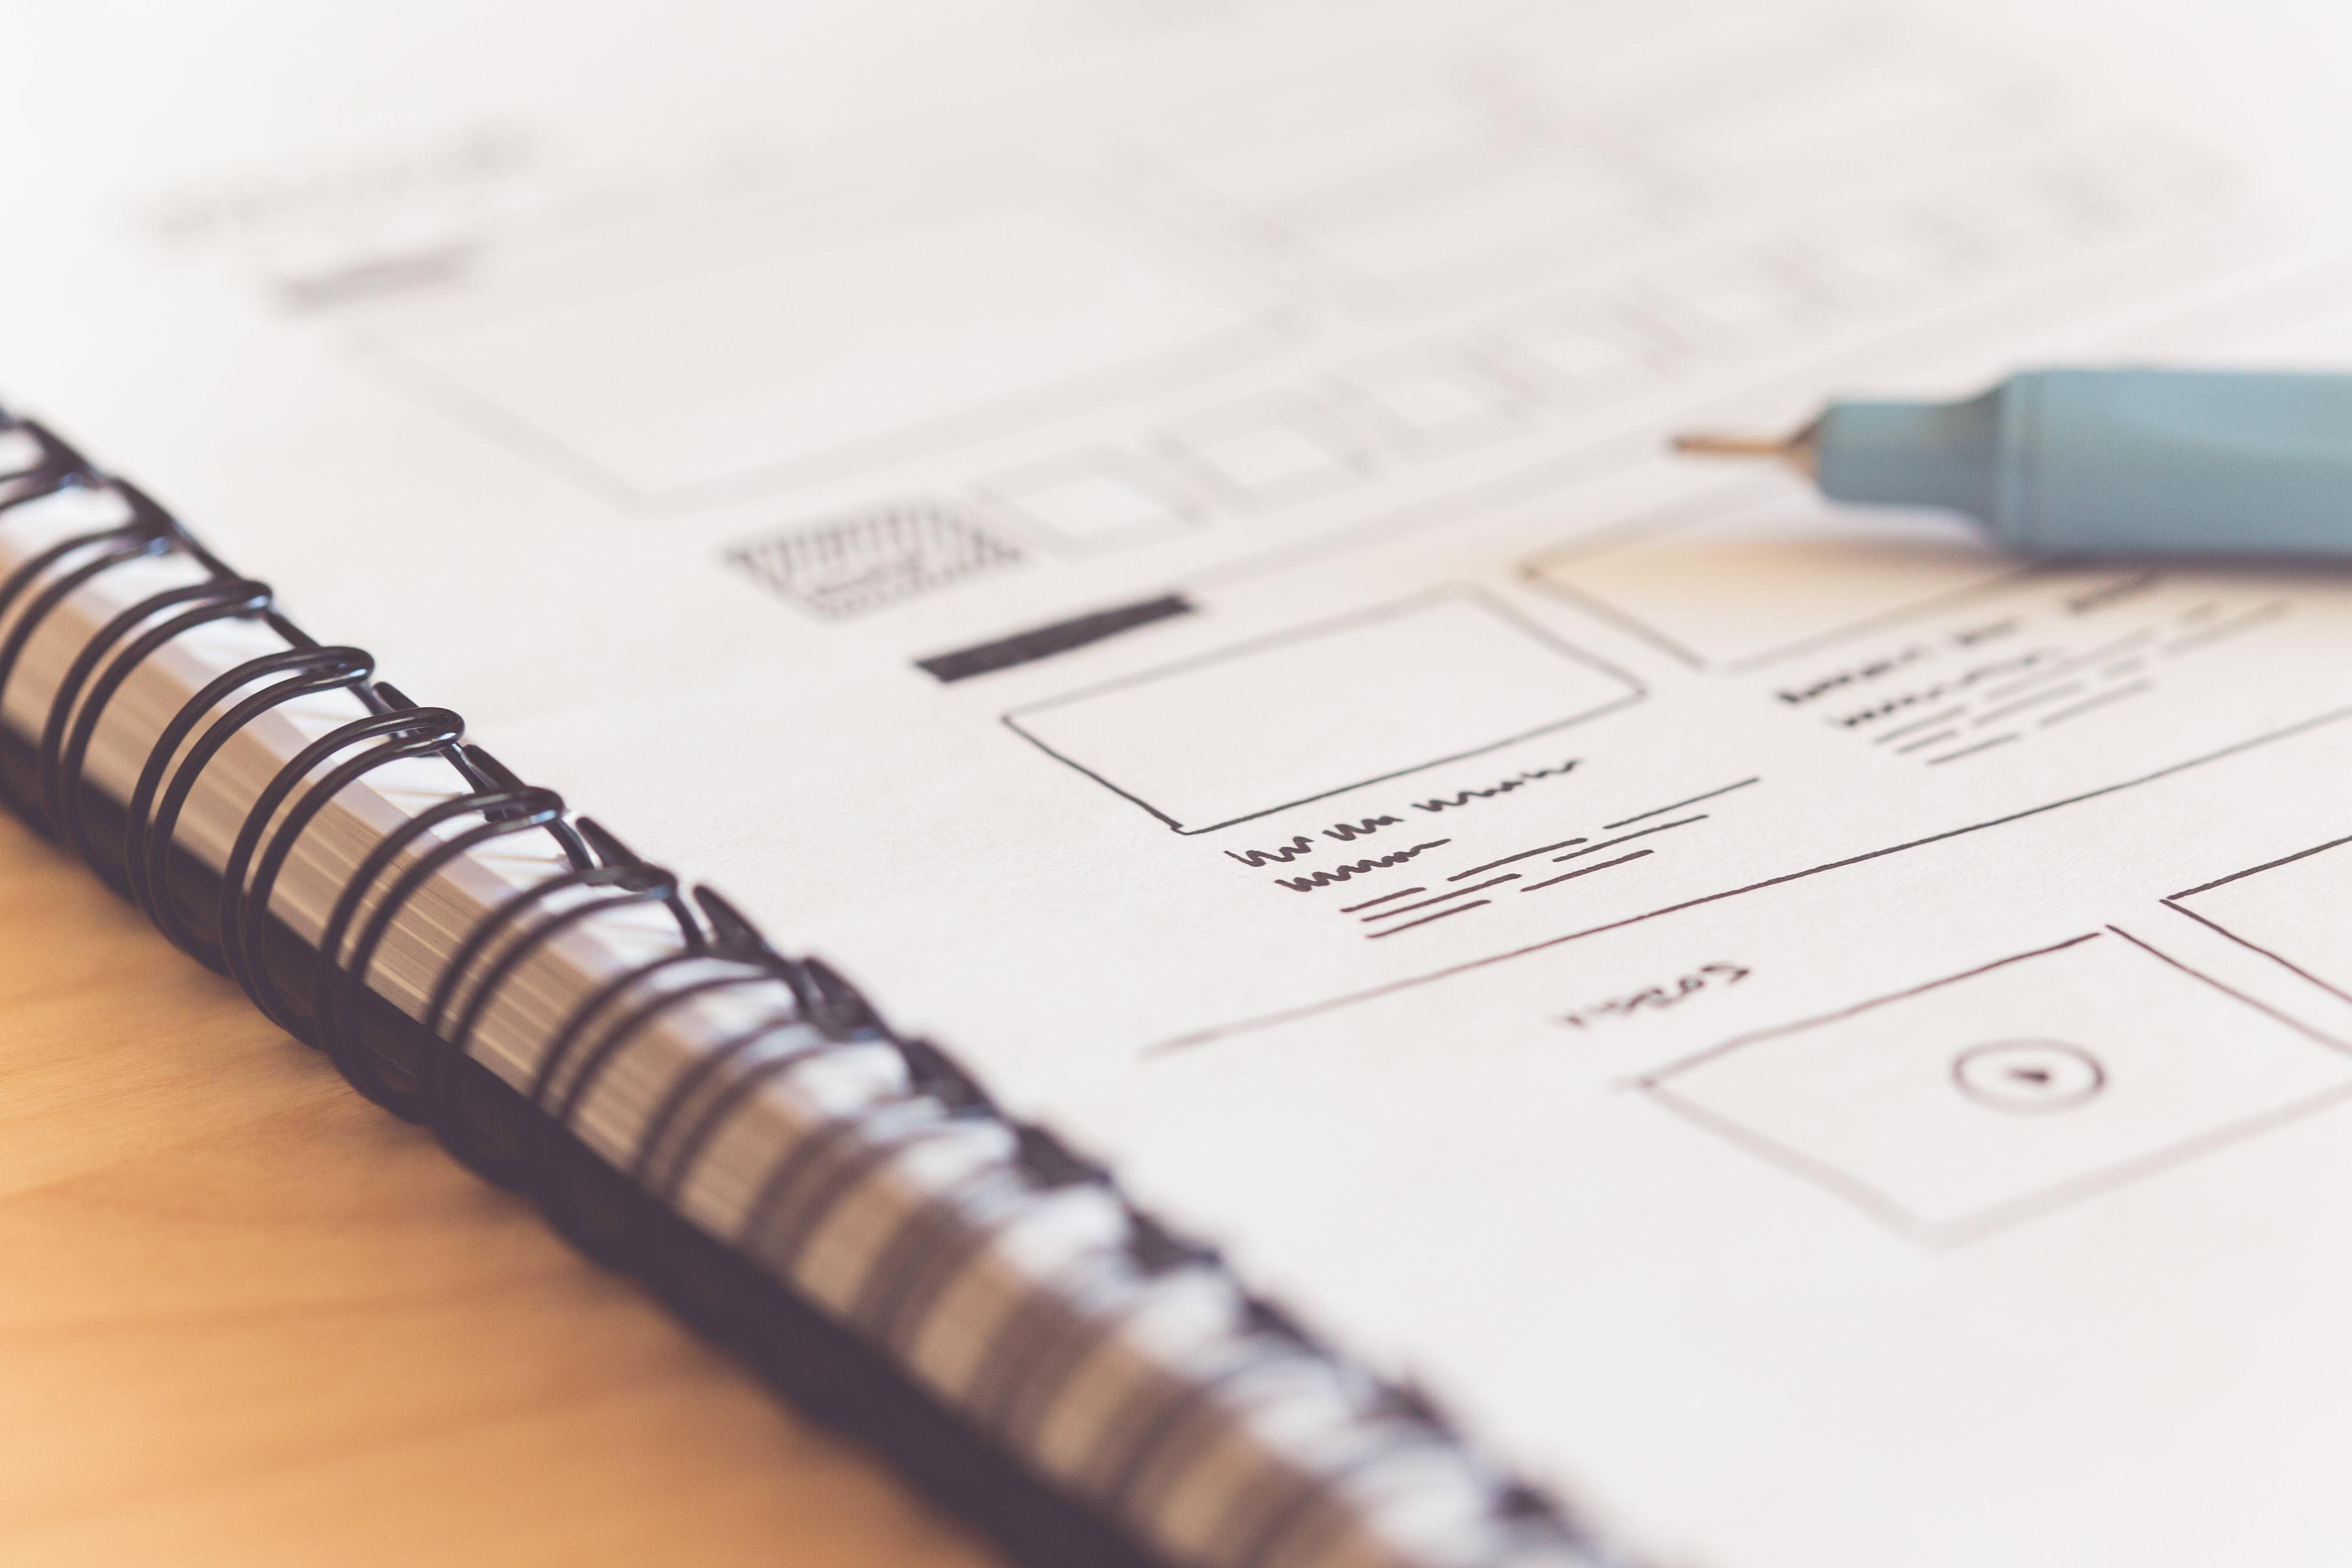 sketching-startup-website-ideas-on-paper-picjumbo-com.jpg